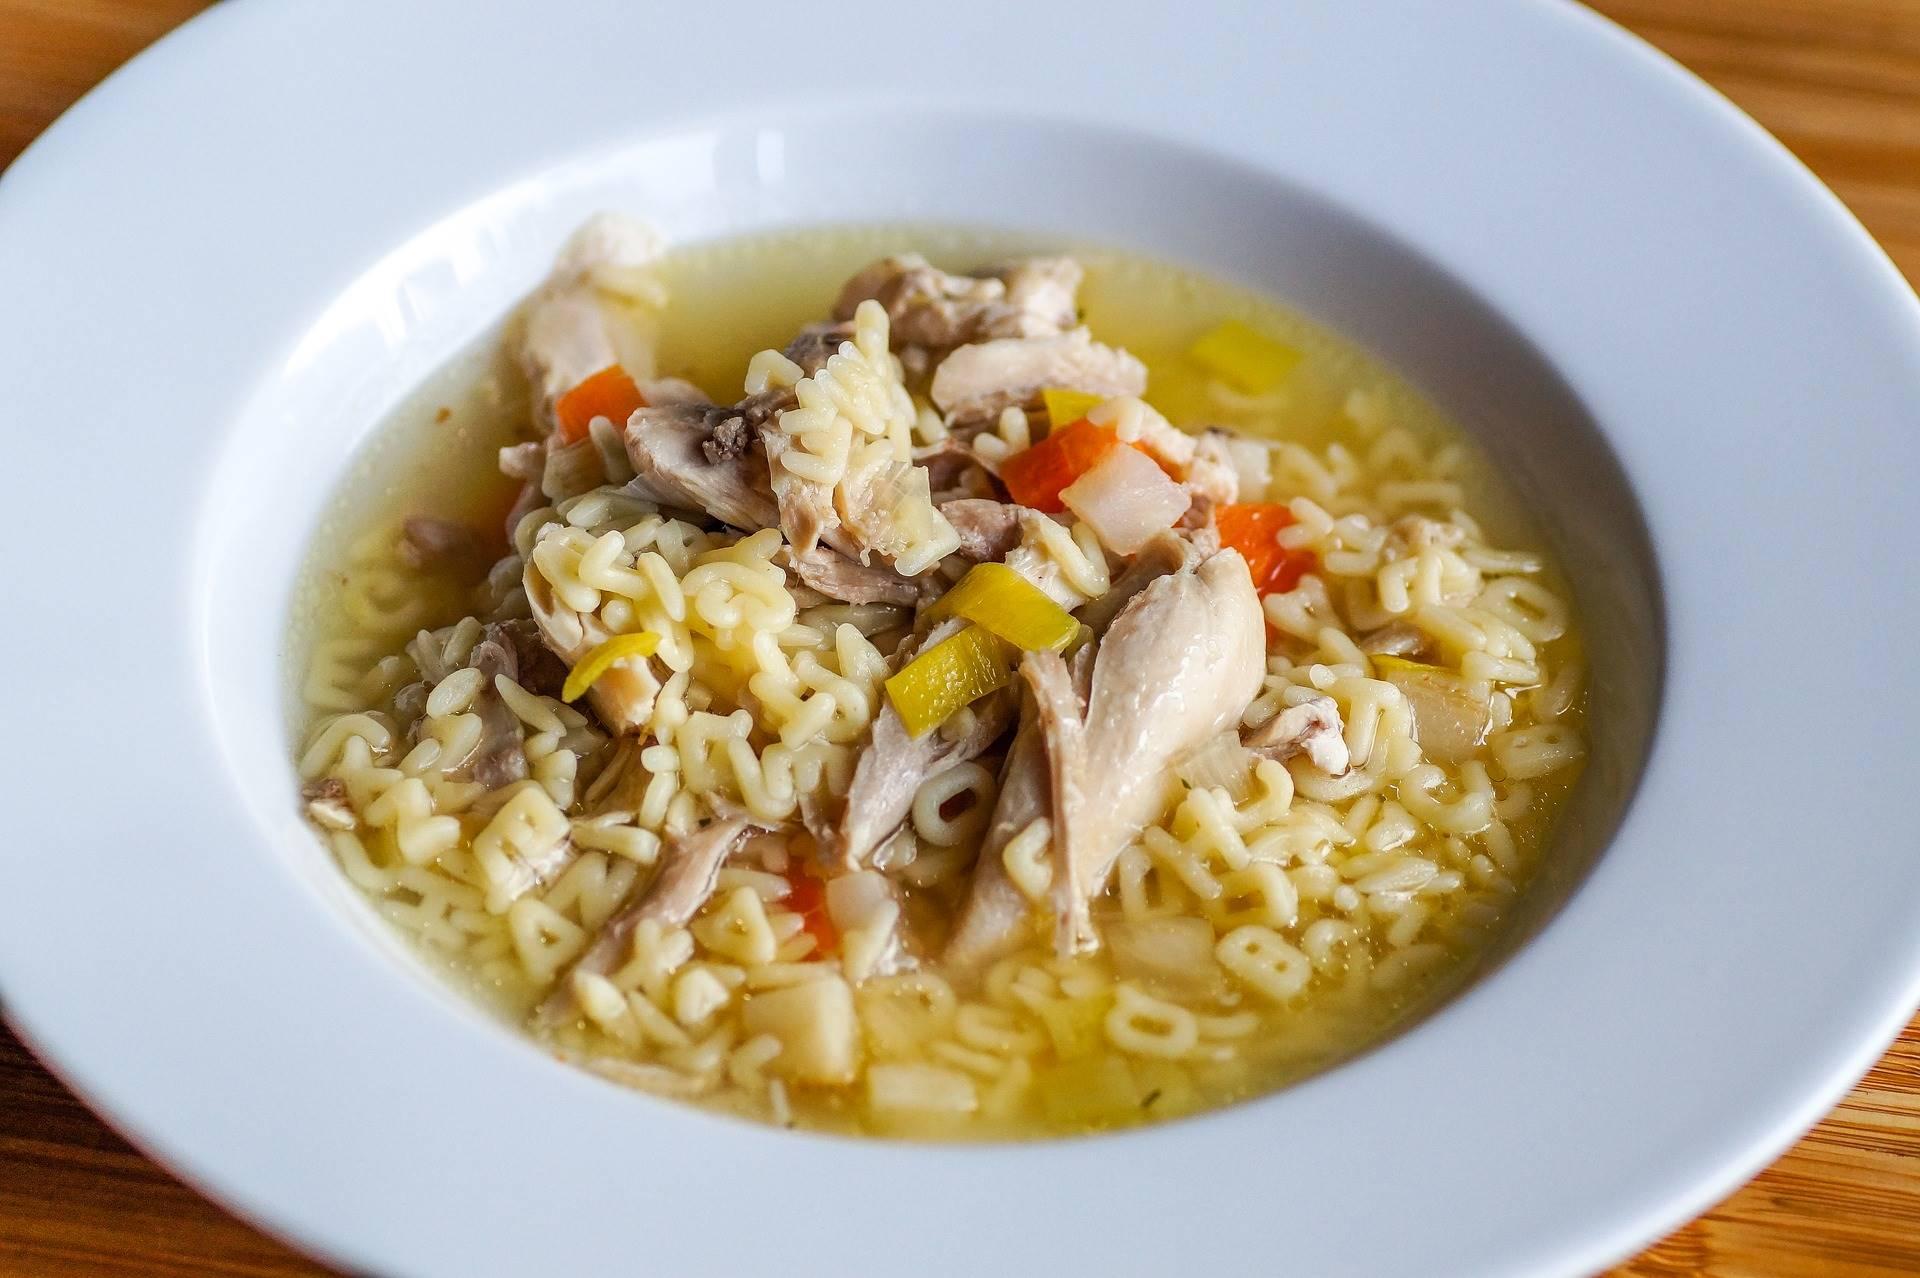 Helpt kippensoep nou echt bij verkoudheid en griep?